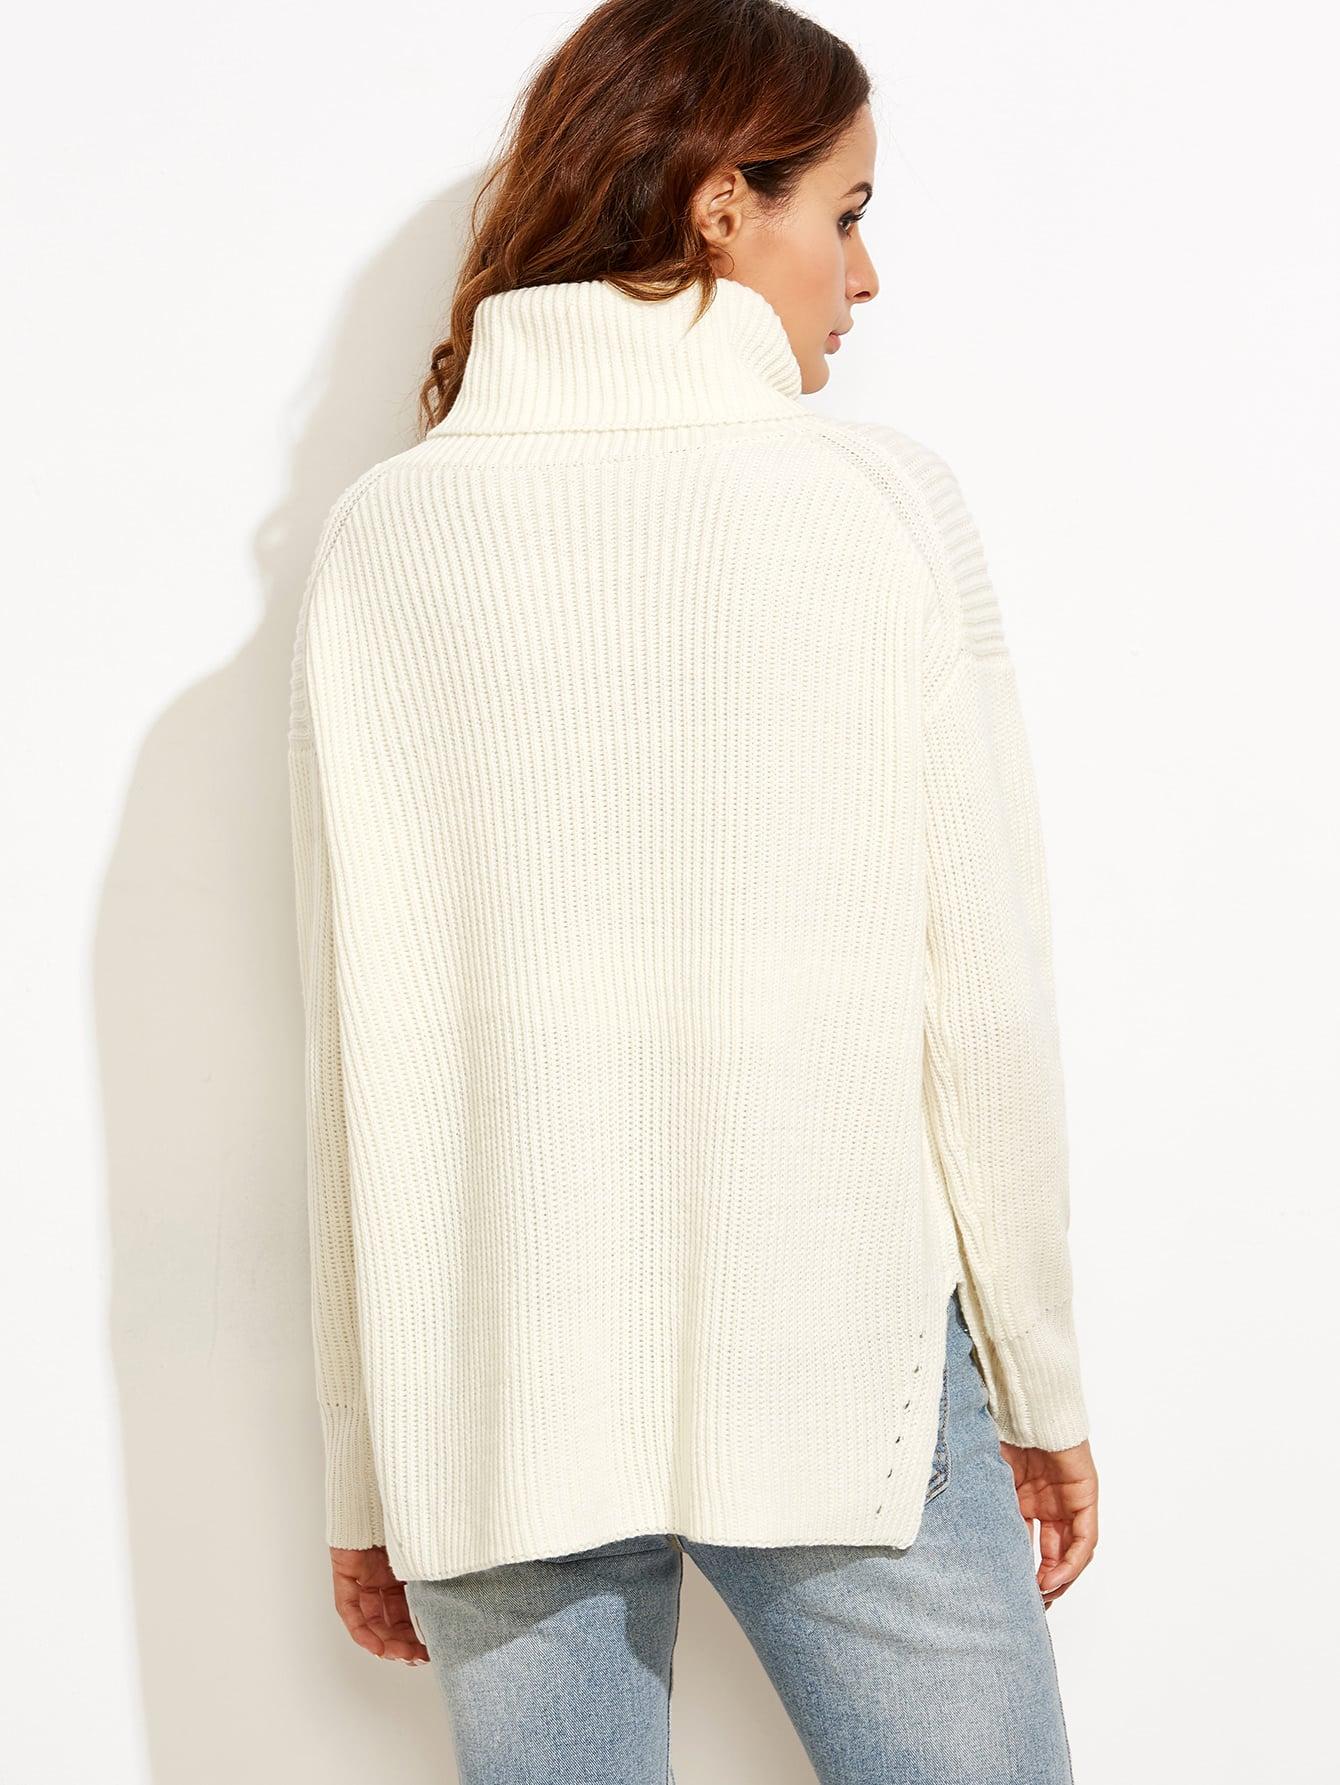 sweater160809706_2